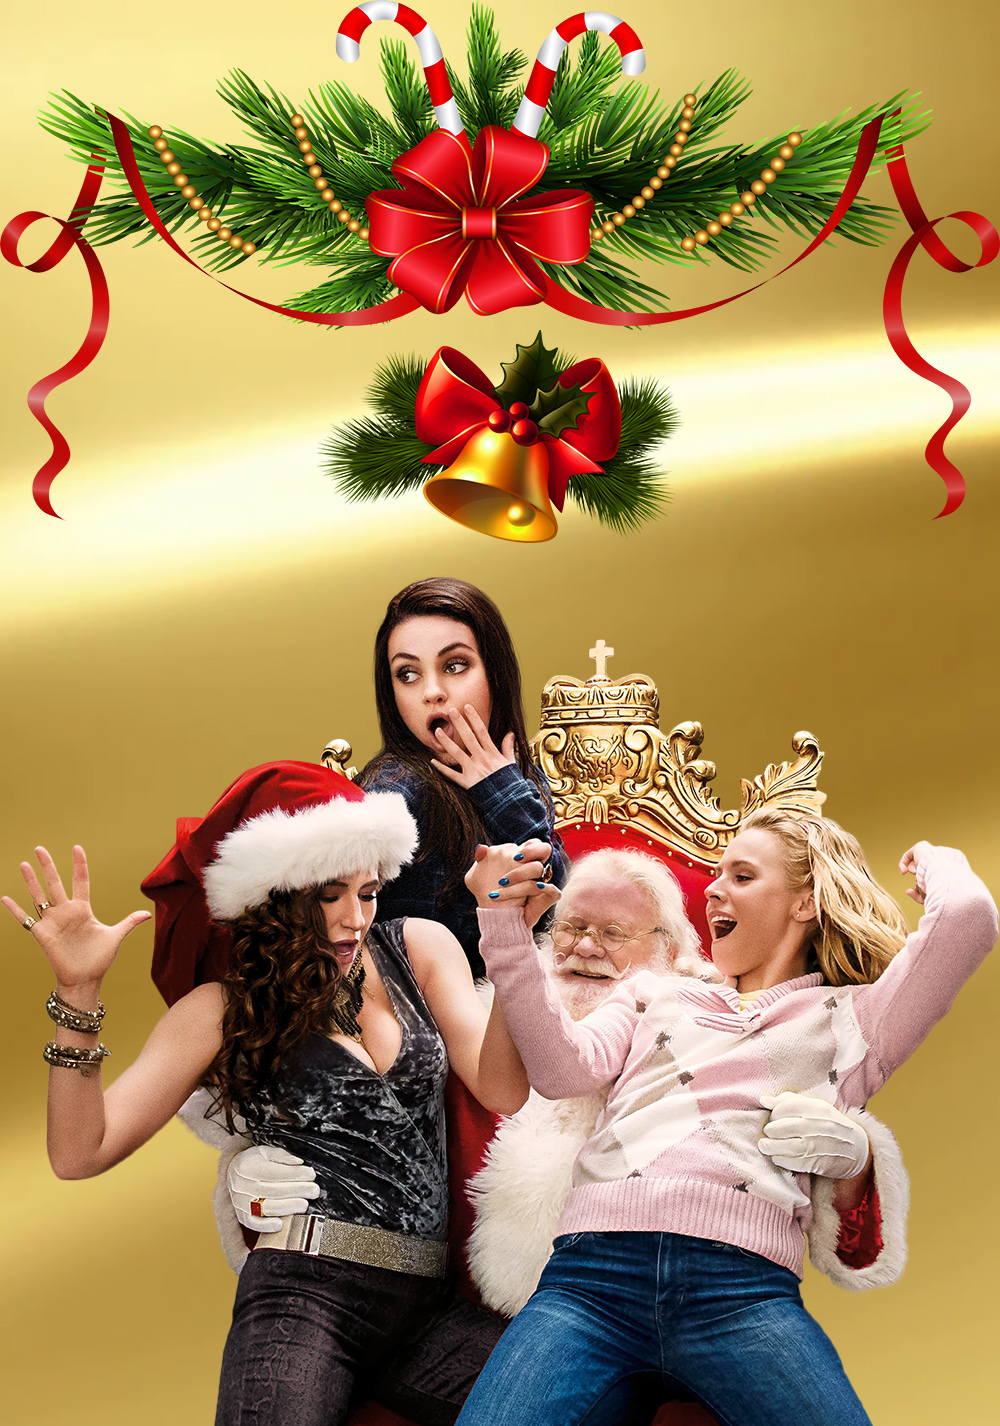 Bad Moms Christmas Poster.A Bad Moms Christmas Movie Fanart Fanart Tv